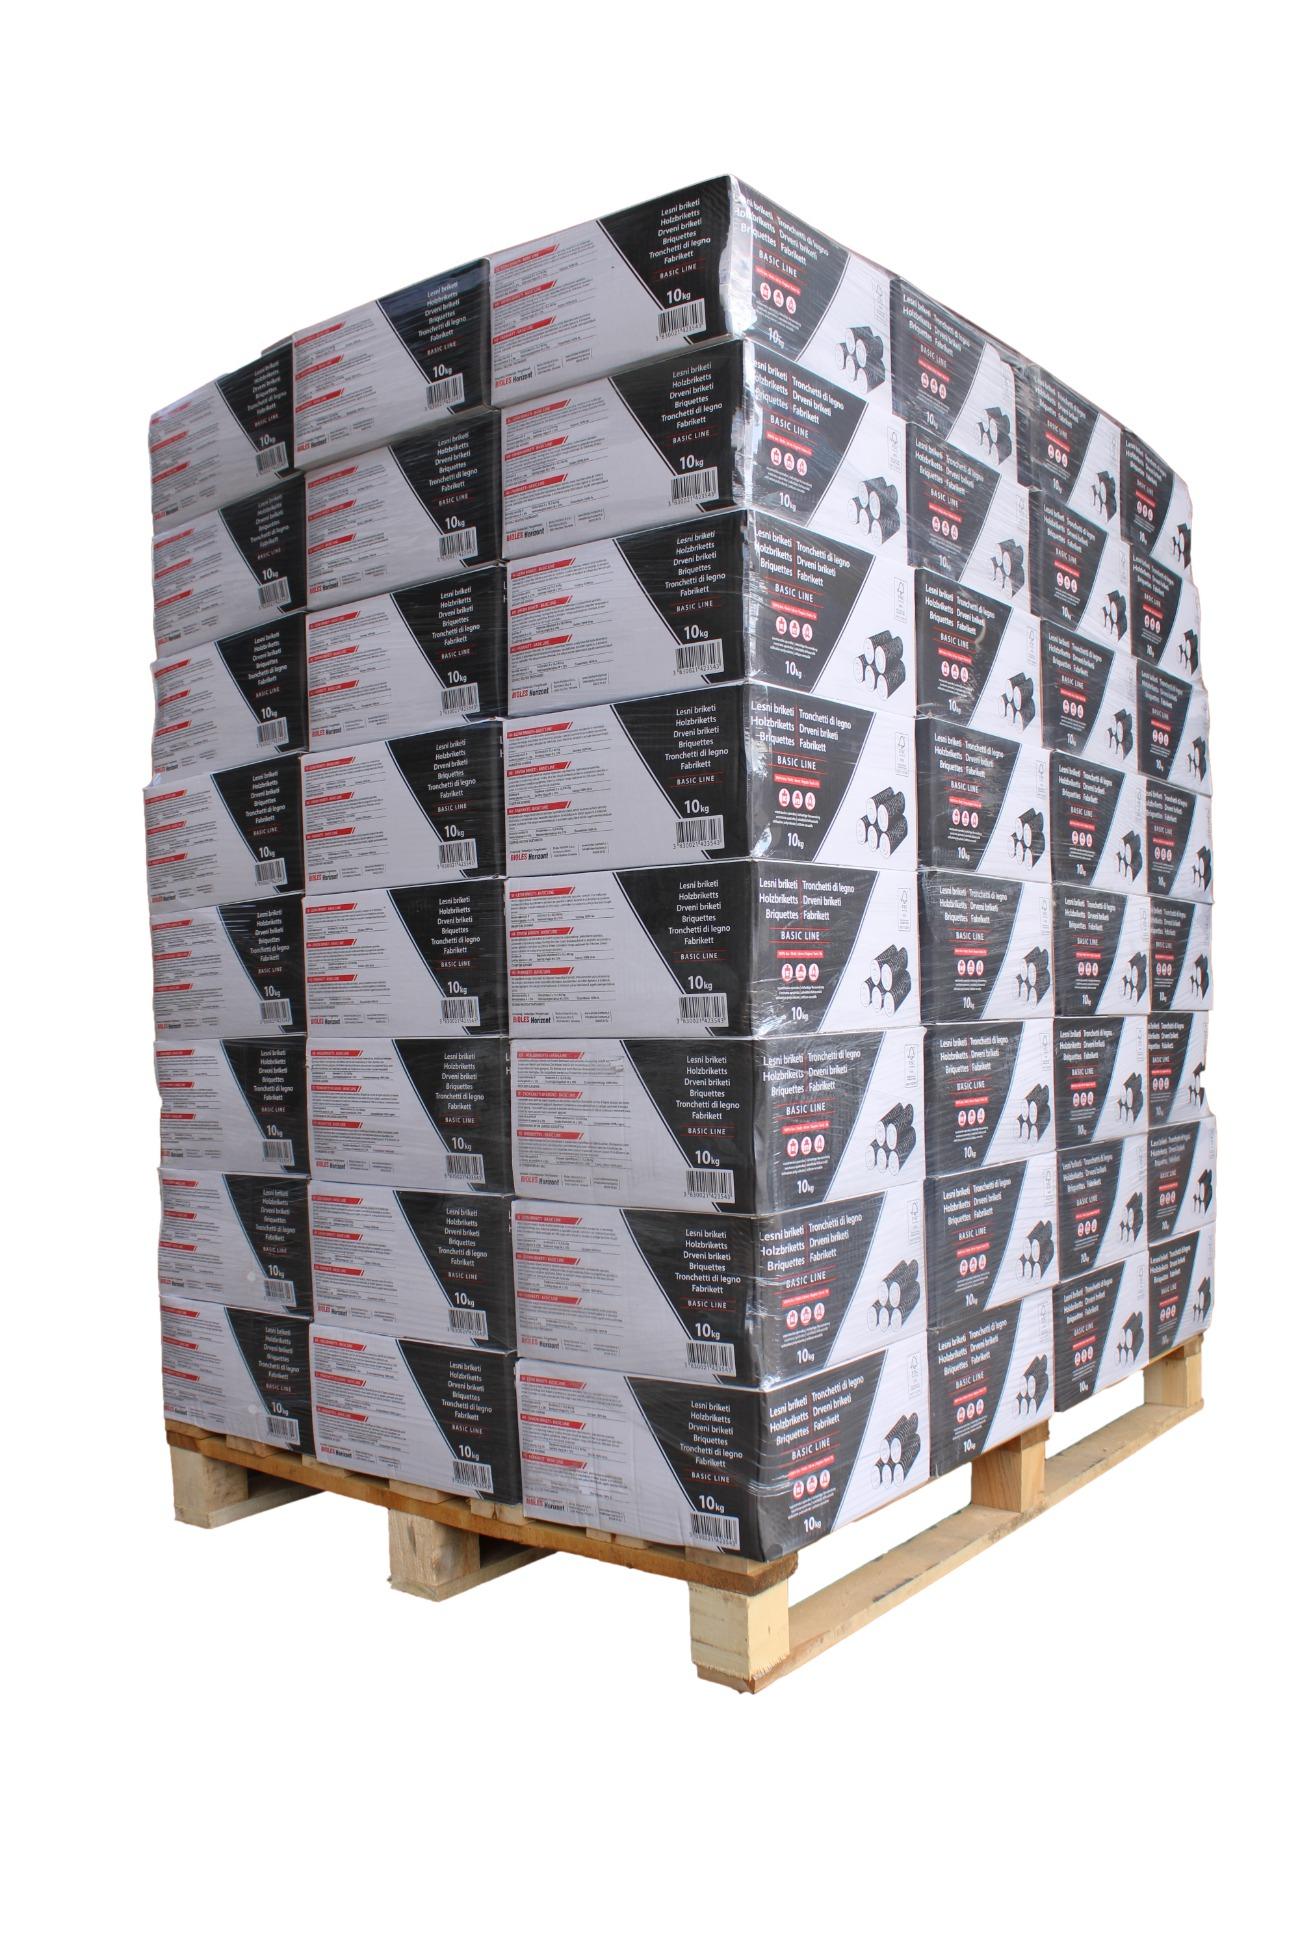 Runde Holzbriketts MISCHHOLZ - 960kg